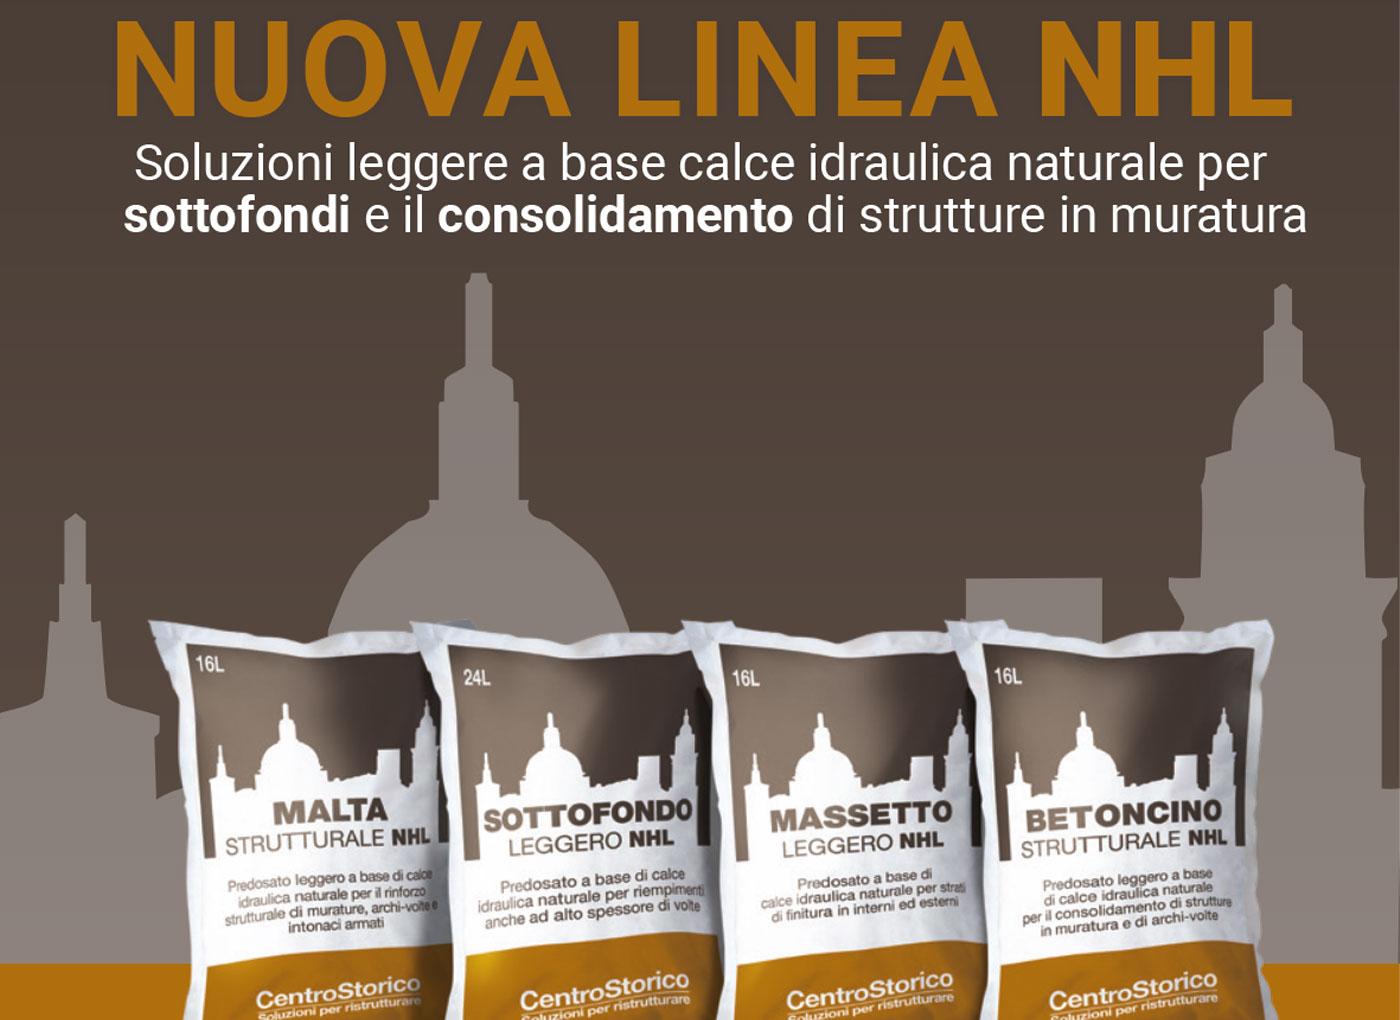 brochure-linea-nhl-sottodfondi-consolidamento